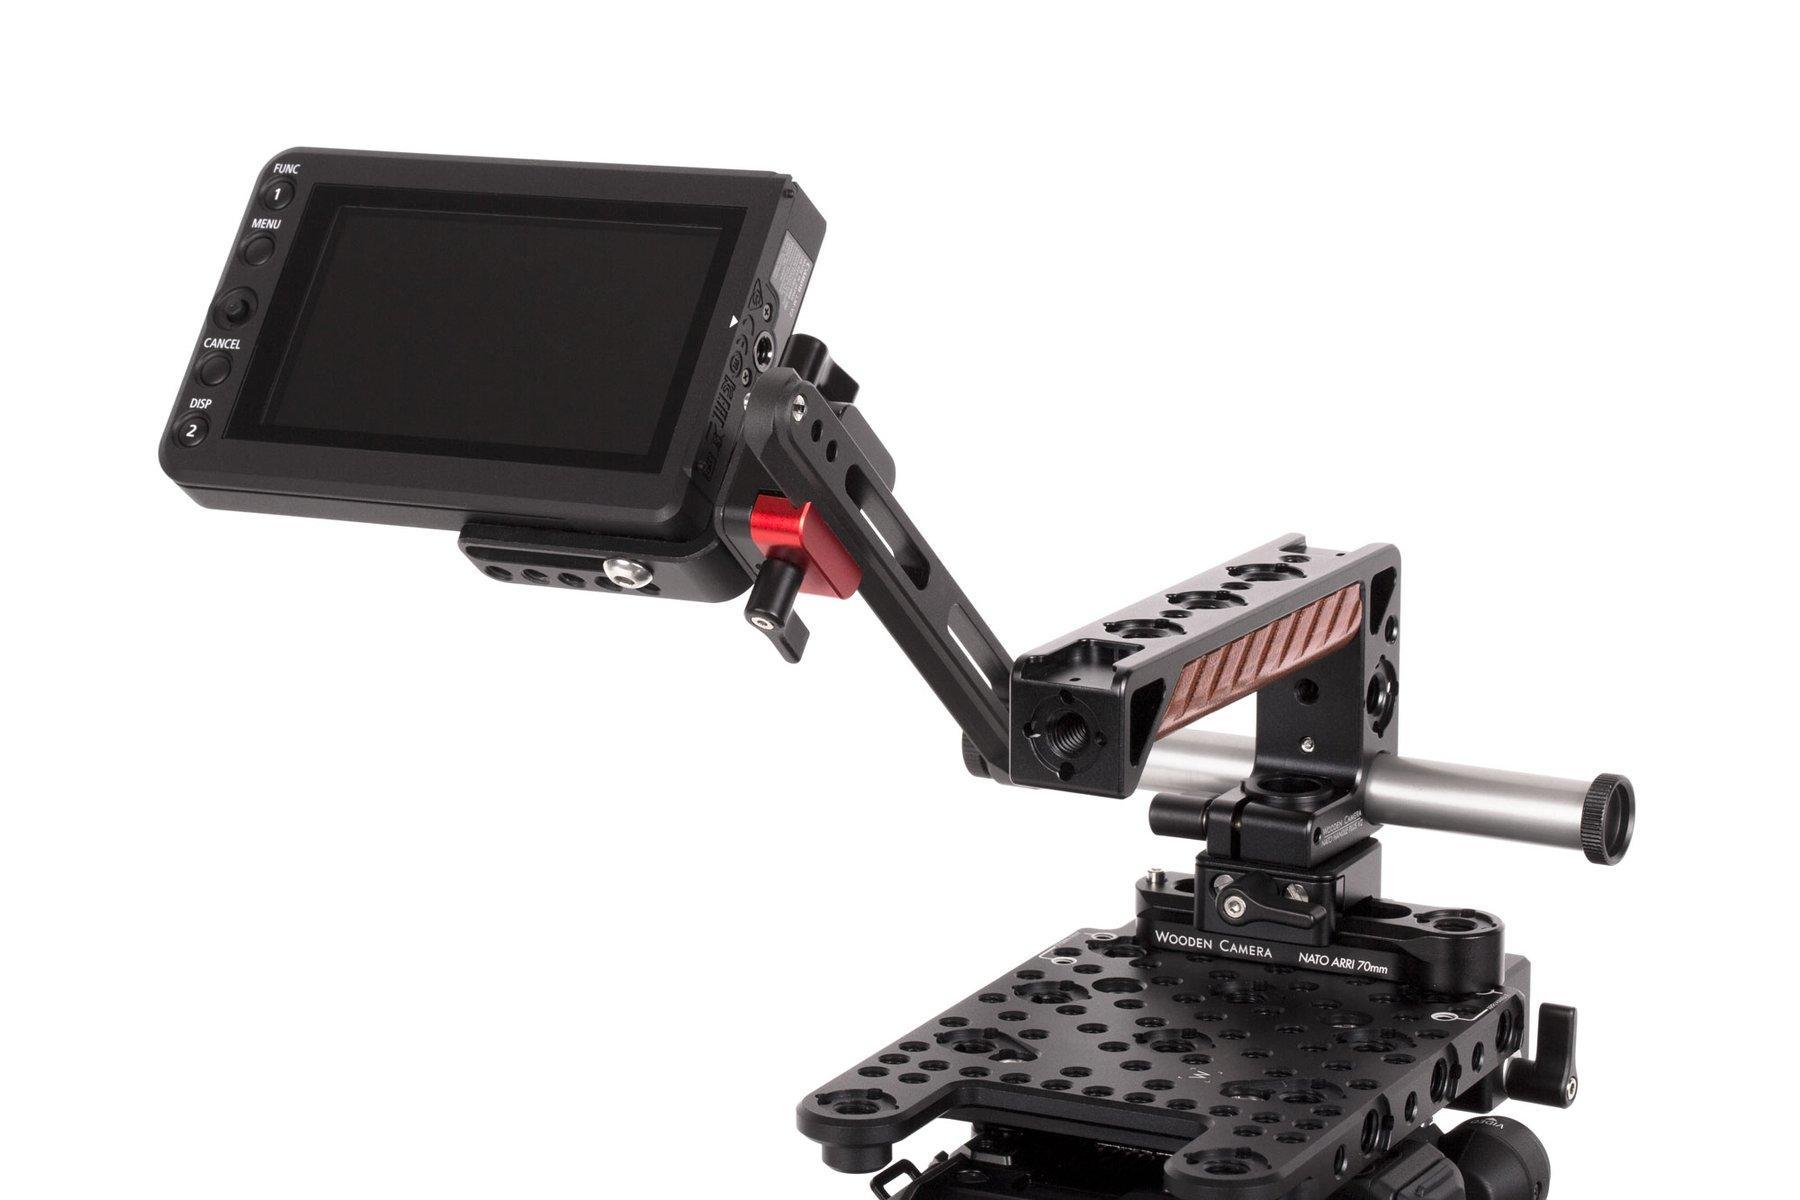 Wooden Camera – Canon C500 MarkII – Pro Kit – Visor